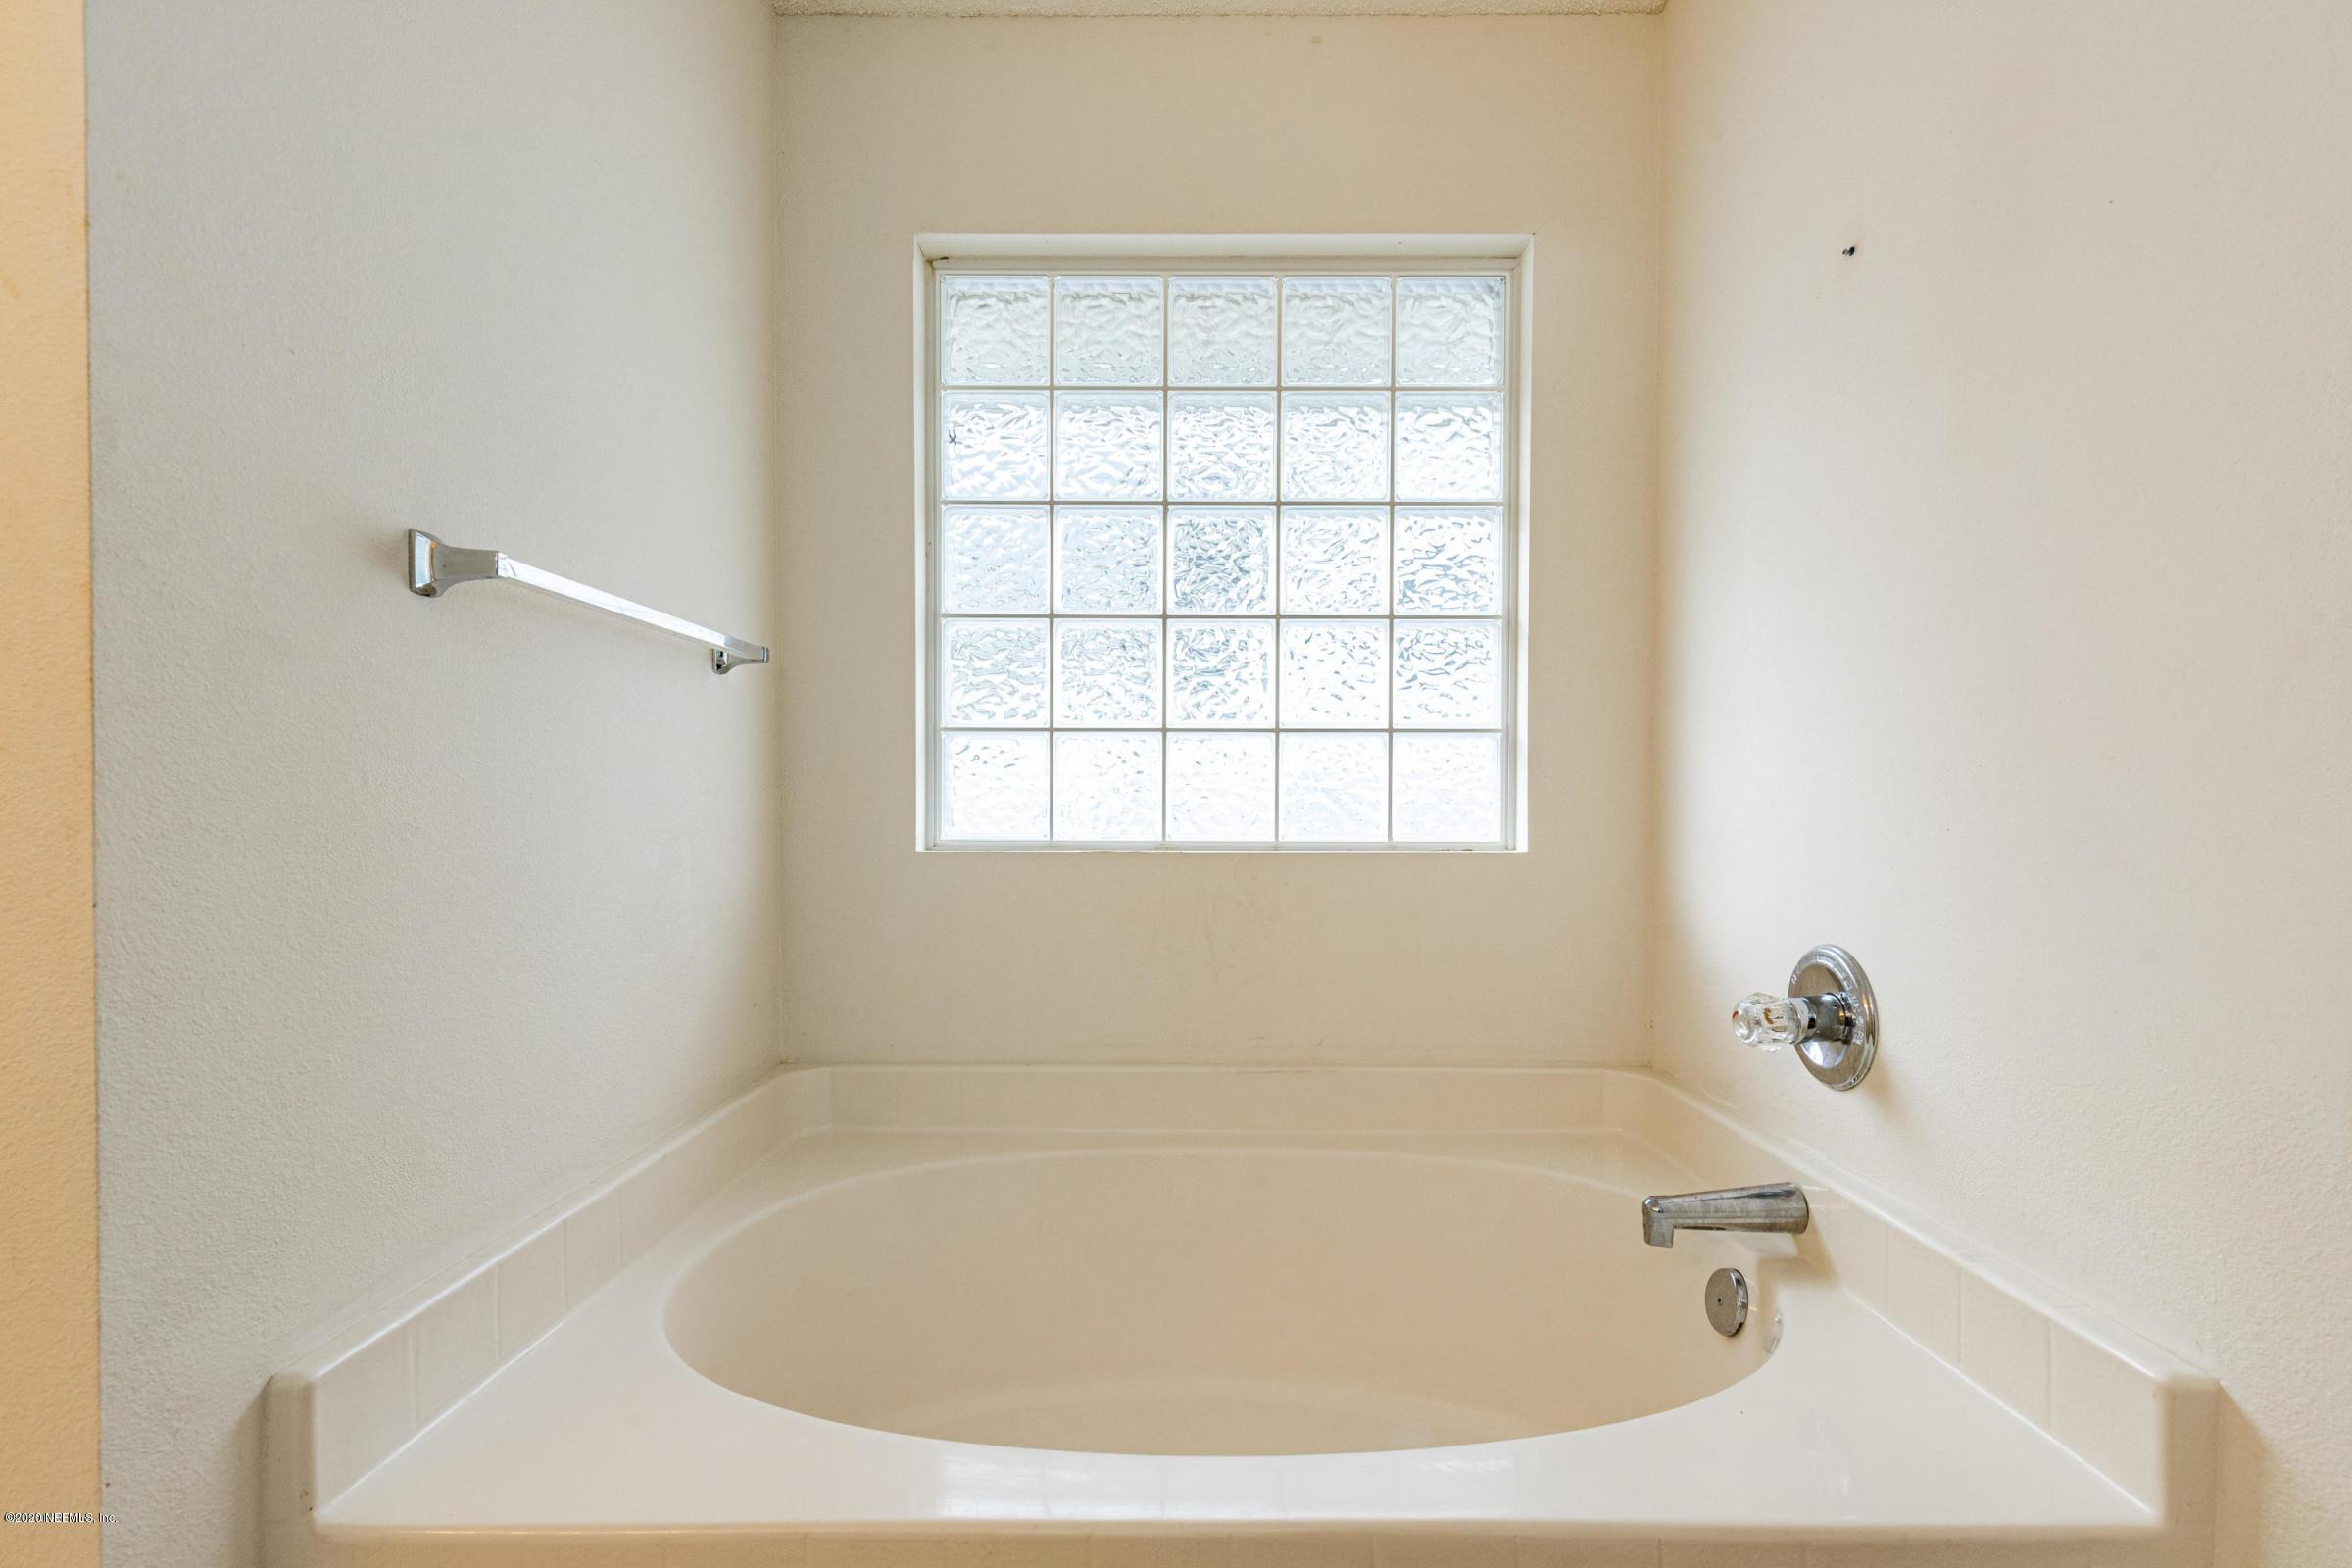 551 TIMBER TRACE, ORANGE PARK, FLORIDA 32073, 4 Bedrooms Bedrooms, ,2 BathroomsBathrooms,Rental,For Rent,TIMBER TRACE,1083270